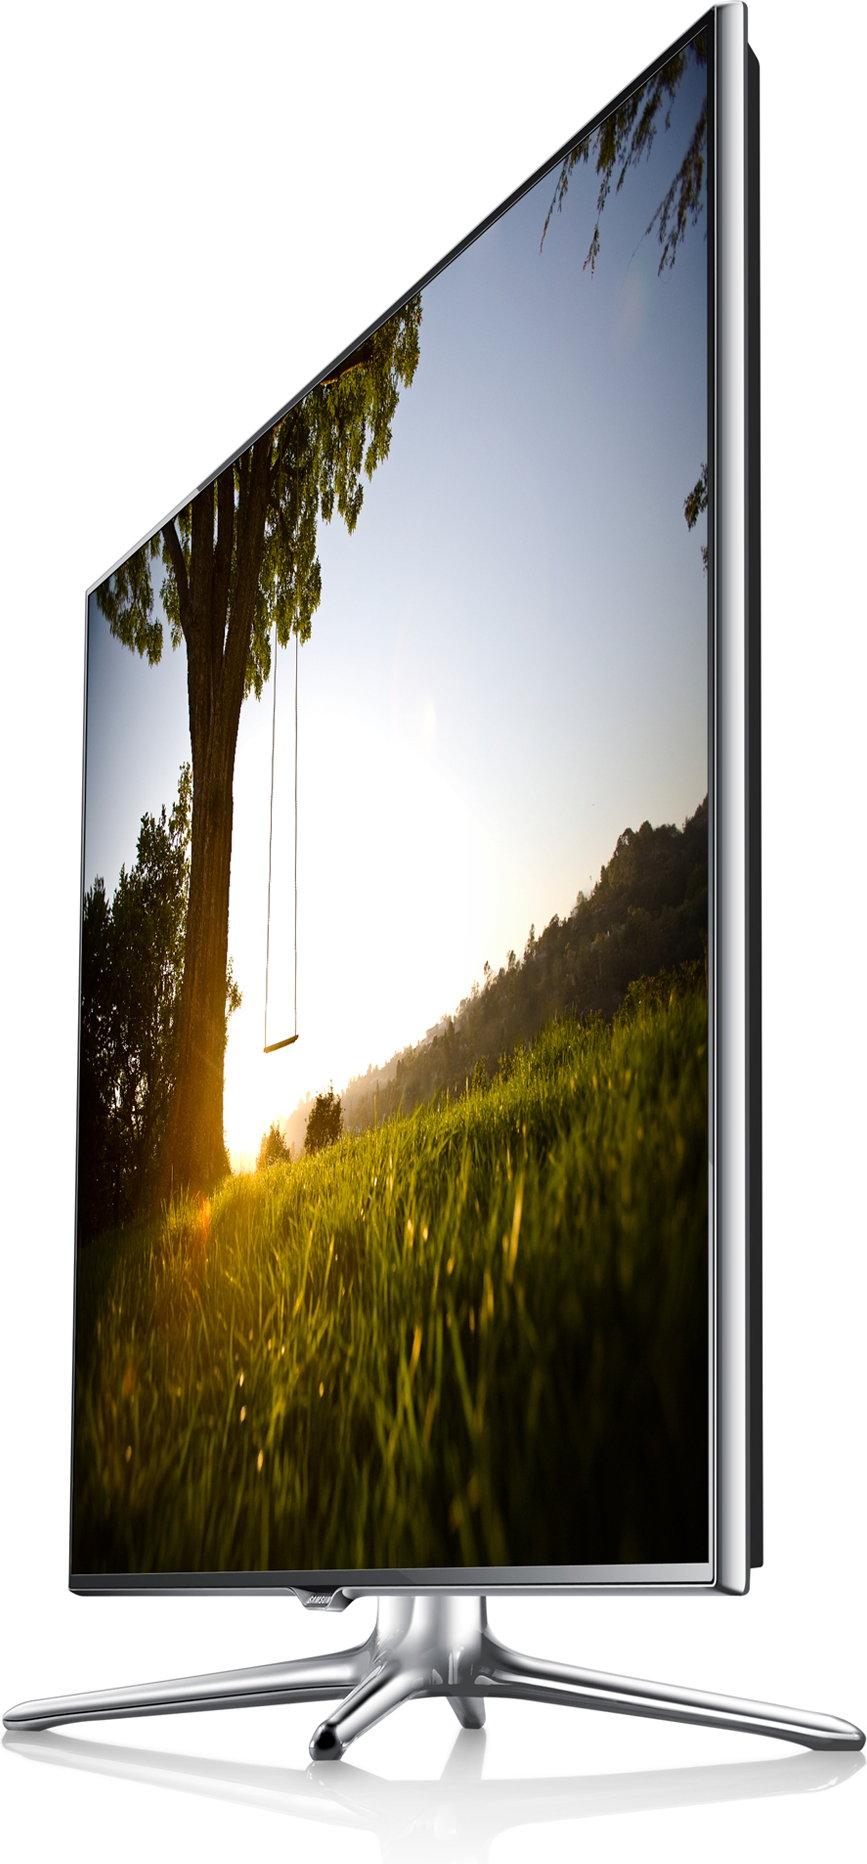 Samsung UE40F6500